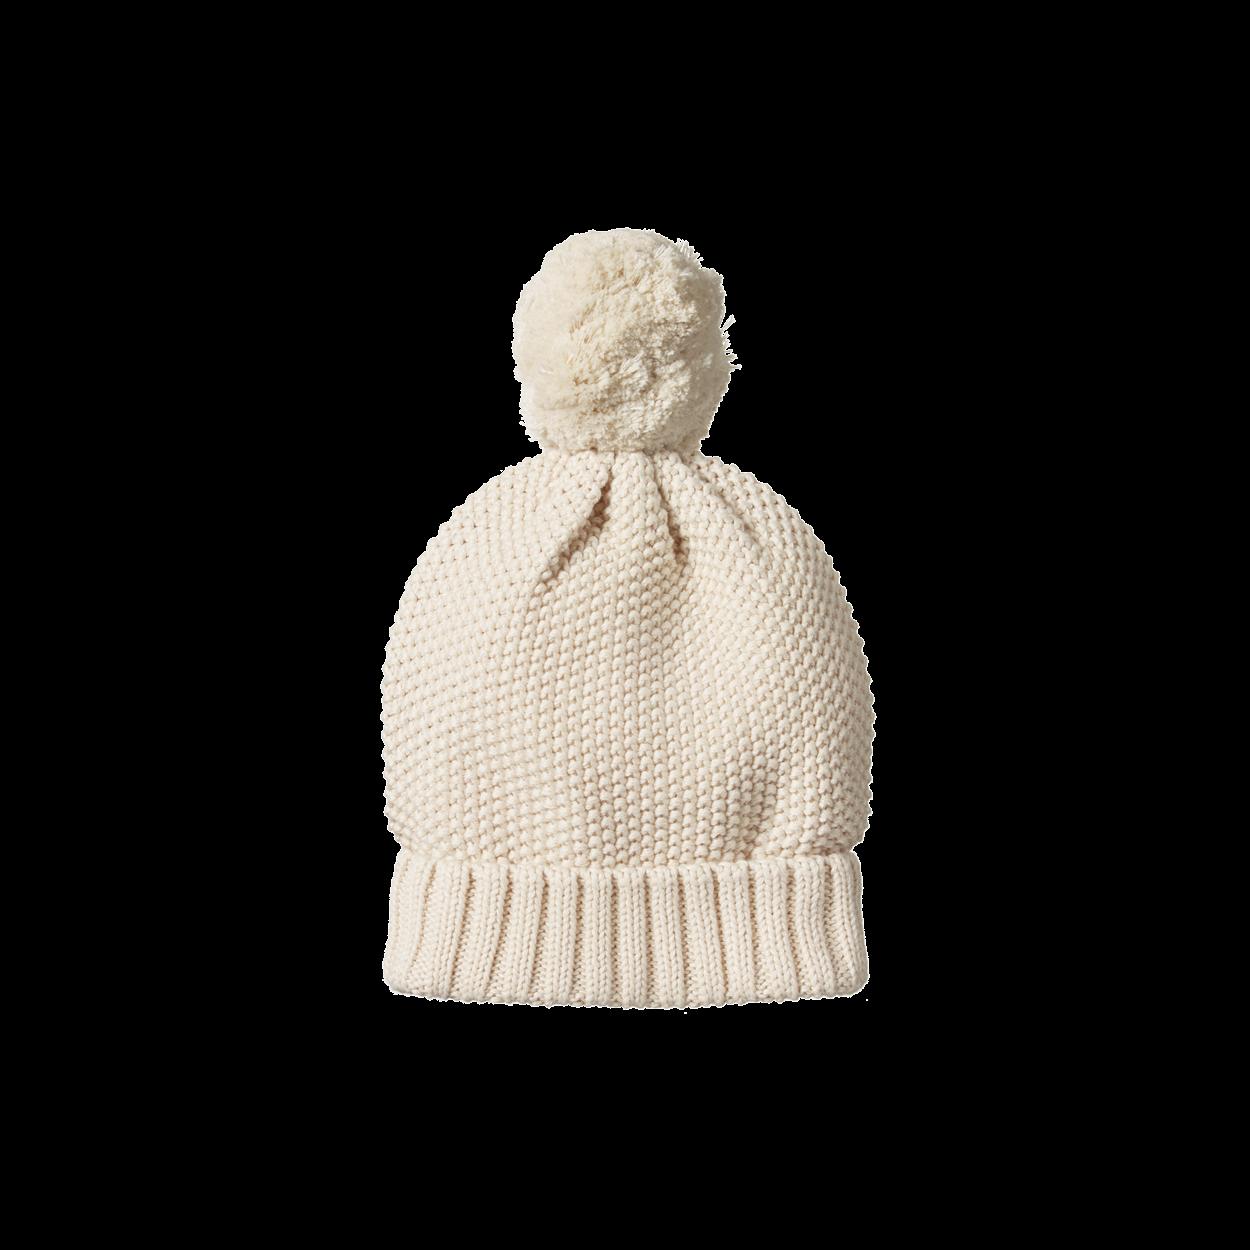 886969e9b Ahoy Pom Pom Beanie | B a b y | Beanie, Knitted hats, Organic cotton ...